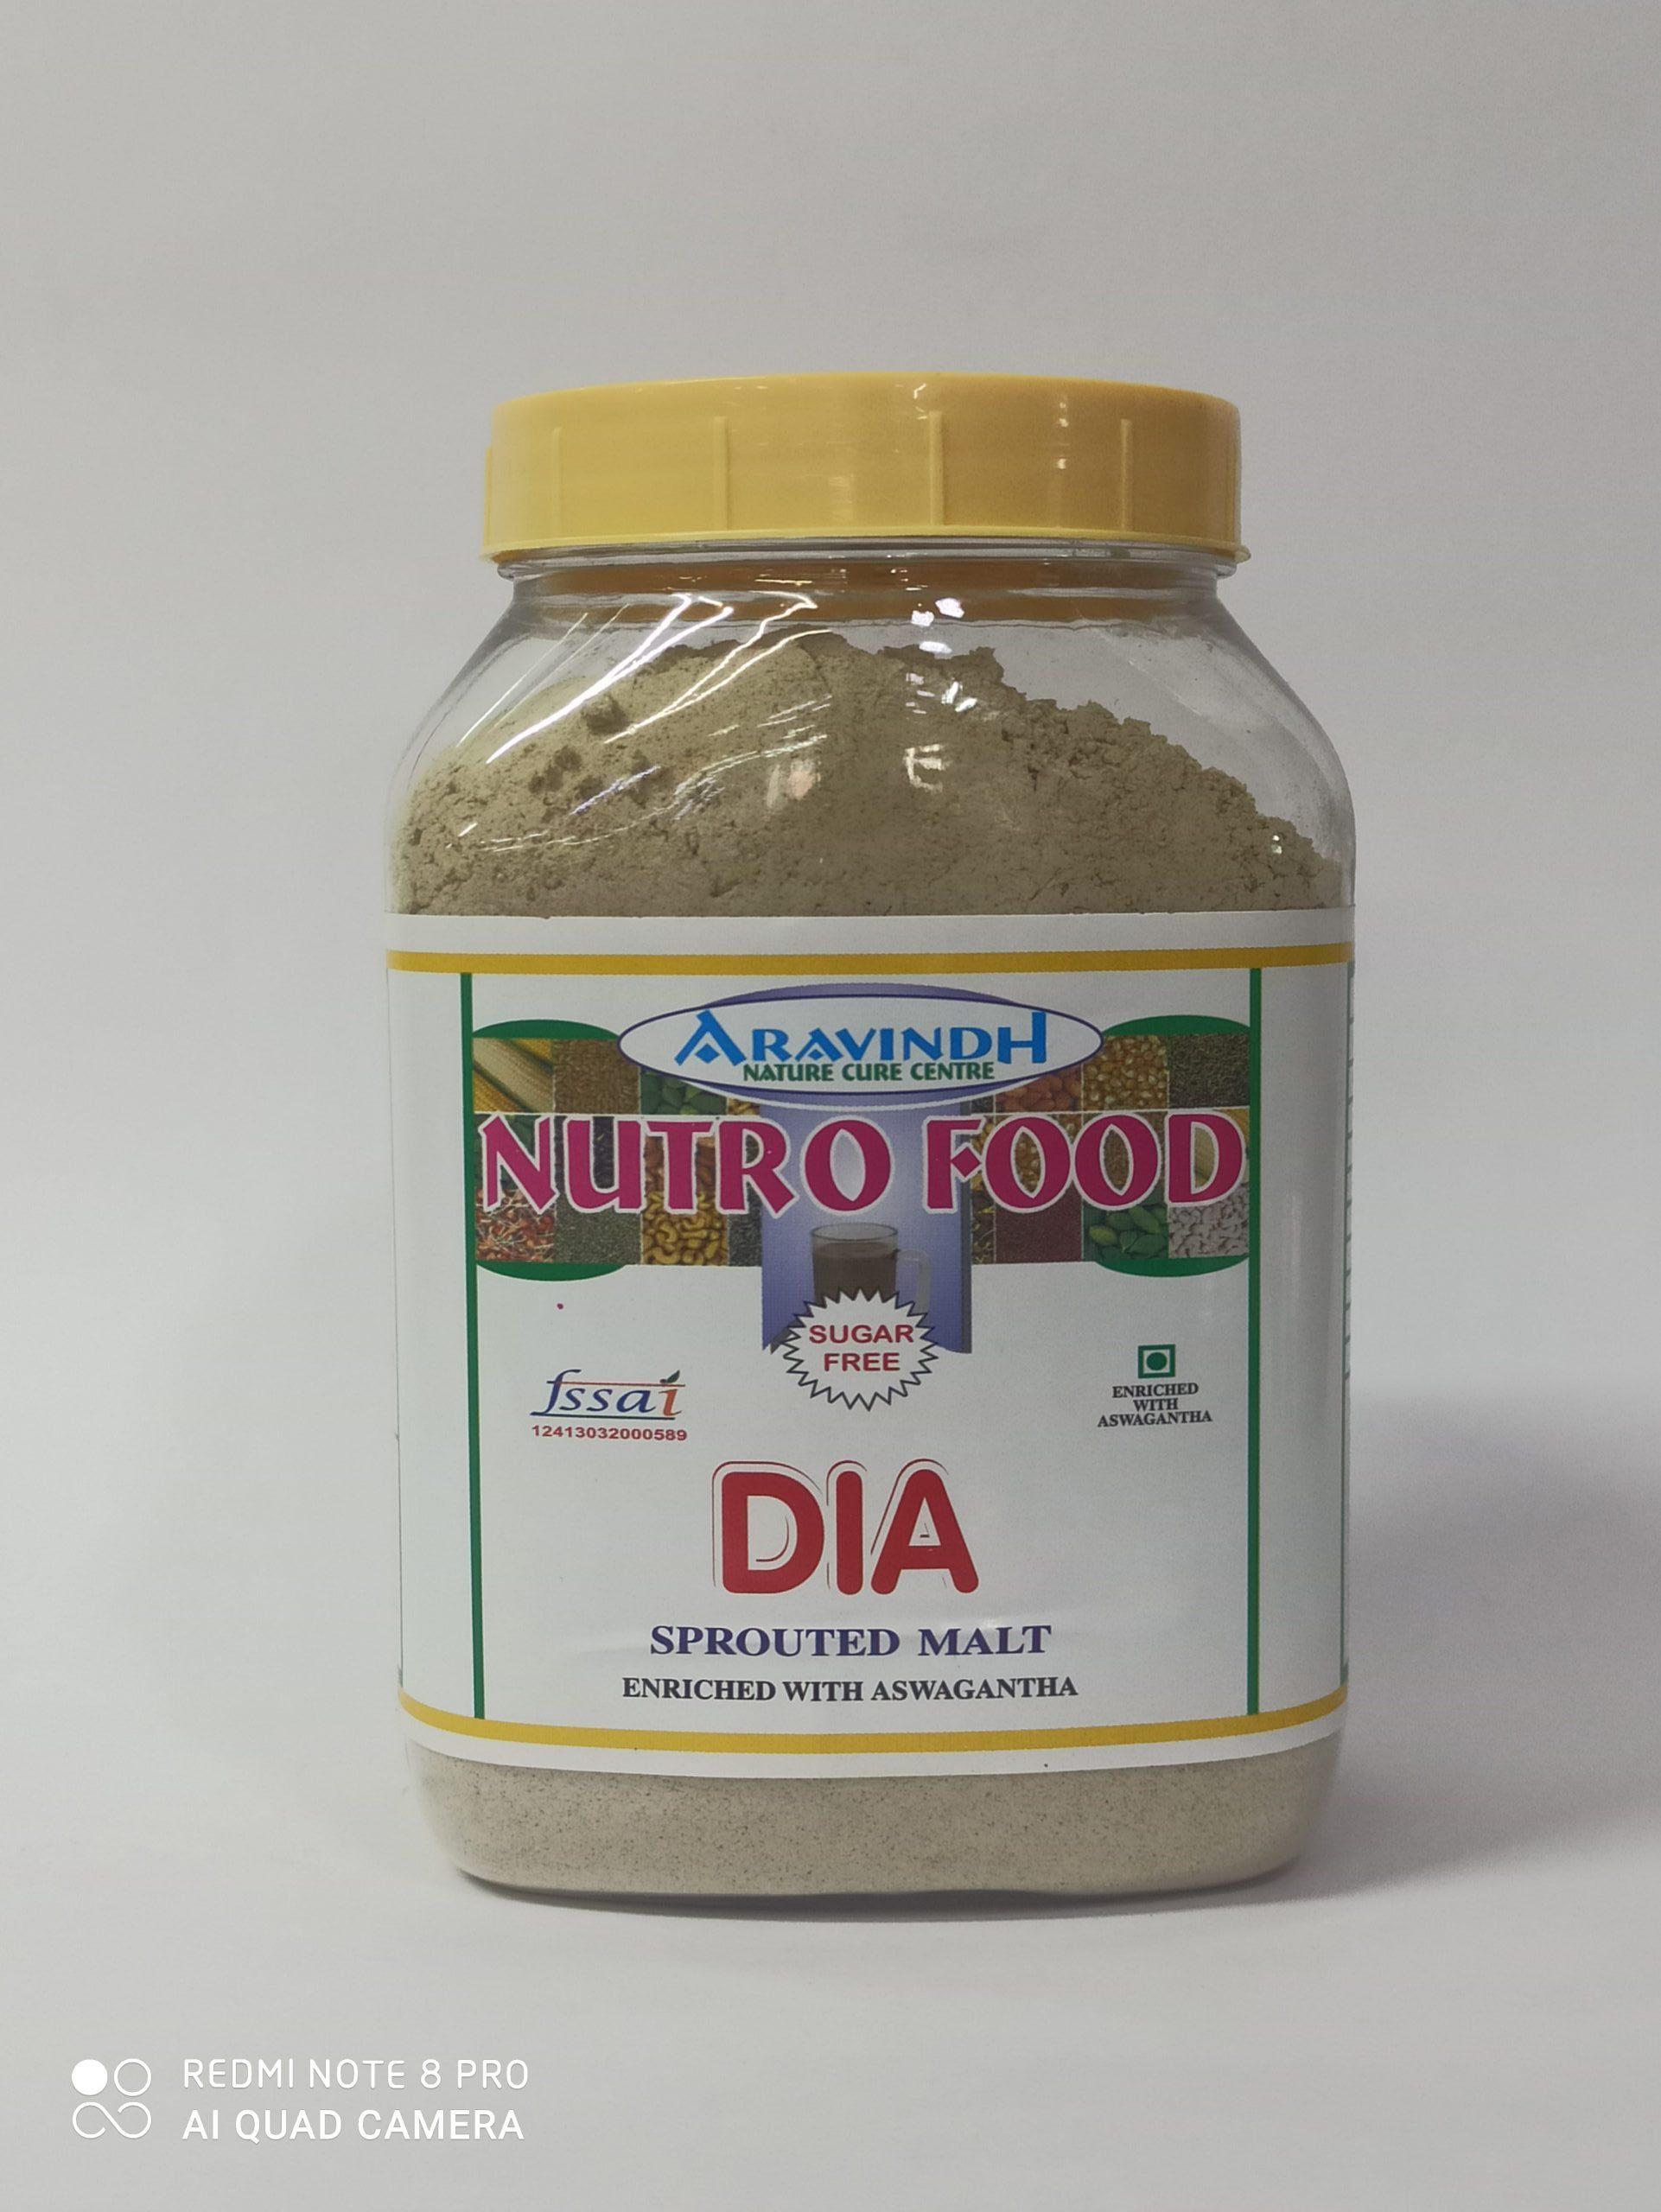 ARAVINDH NUTRO FOOD SUGAR FREE DAI 500GM